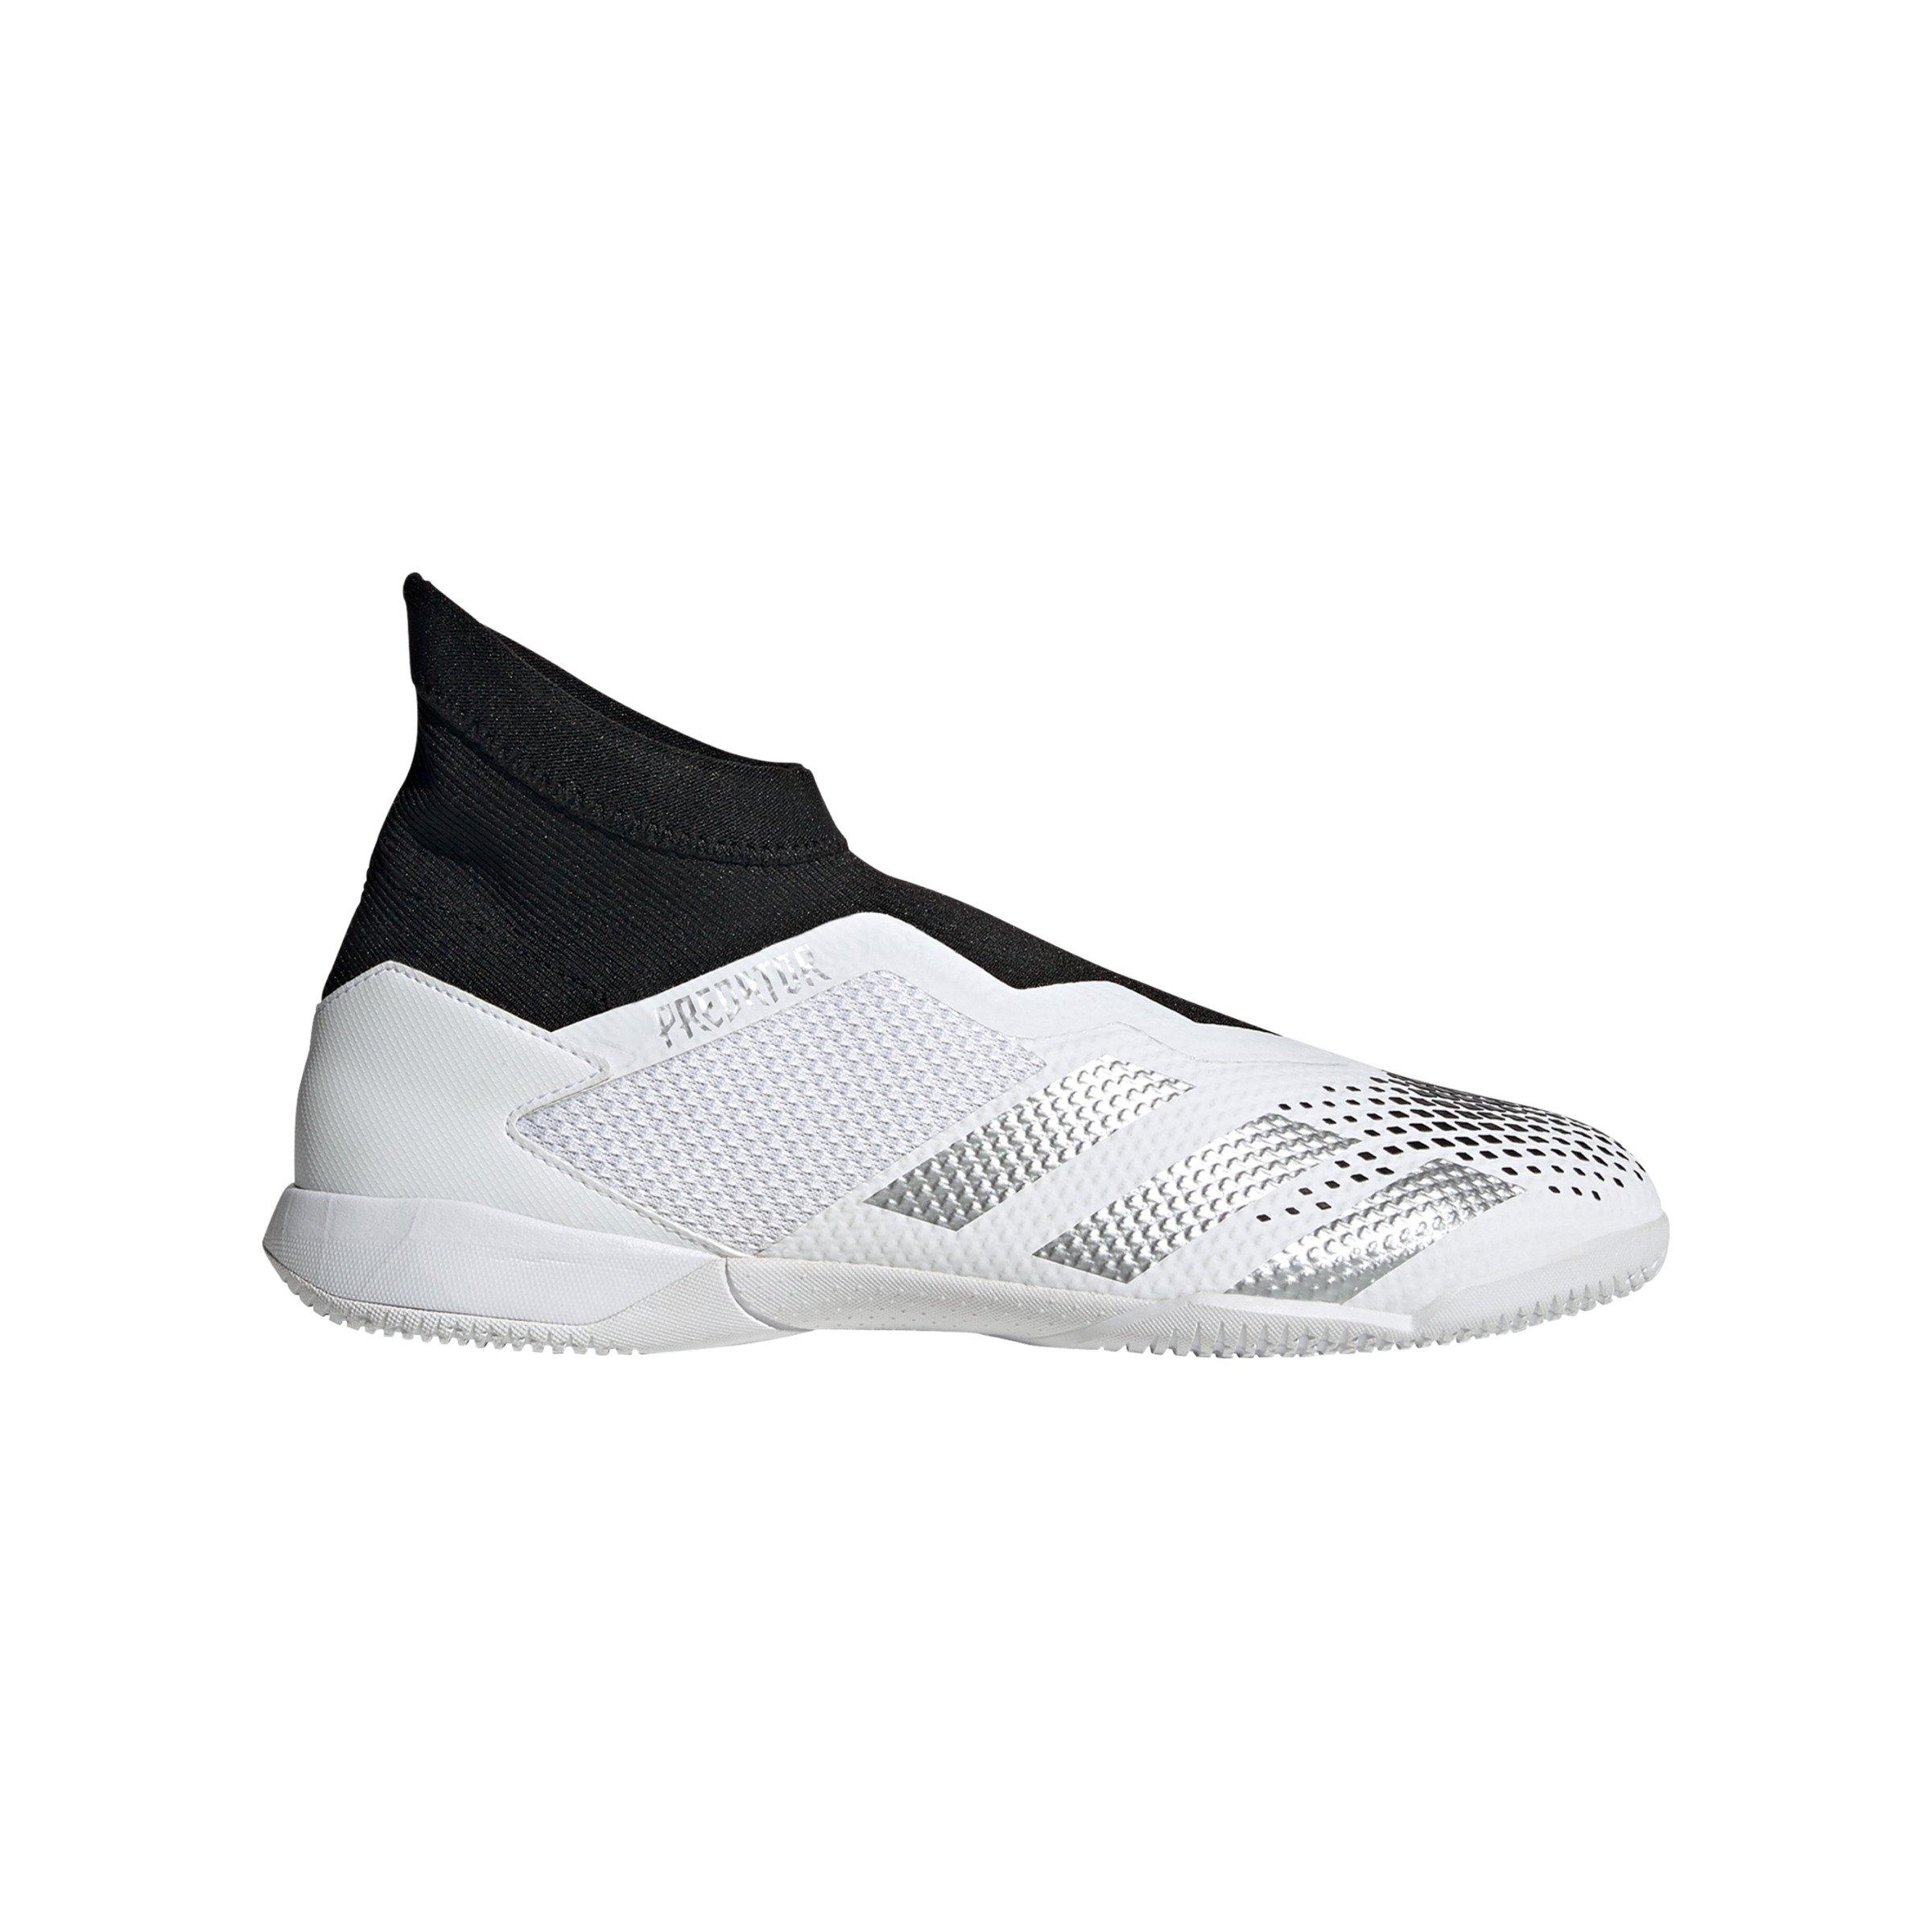 adidas Predator Inflight 20.3 LL IN Halle Weiss - weiss